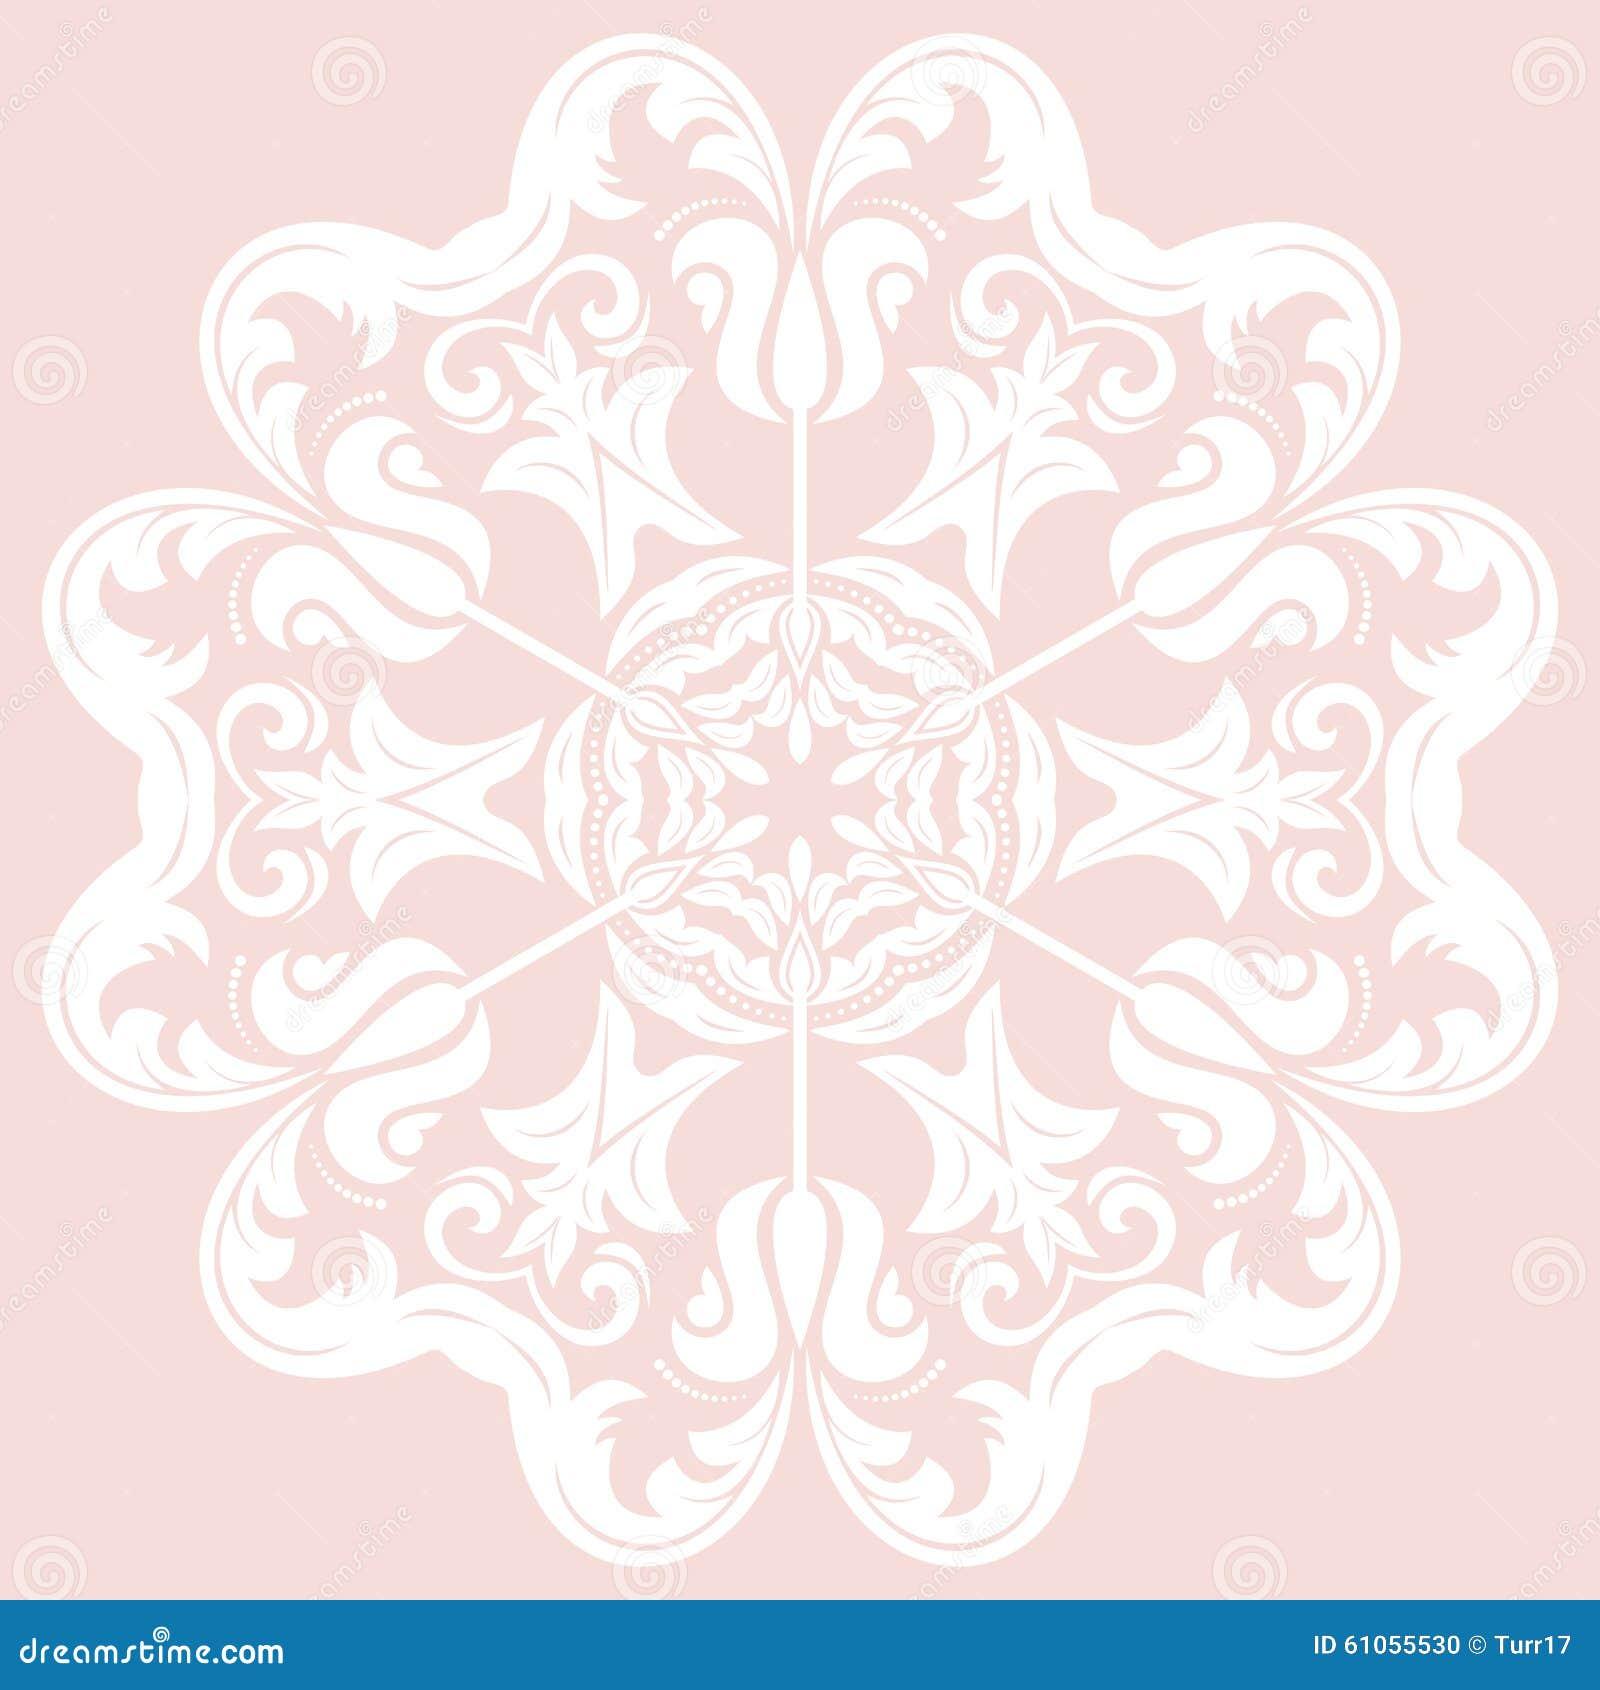 orientalisches abstraktes muster stock abbildung bild 61055530. Black Bedroom Furniture Sets. Home Design Ideas